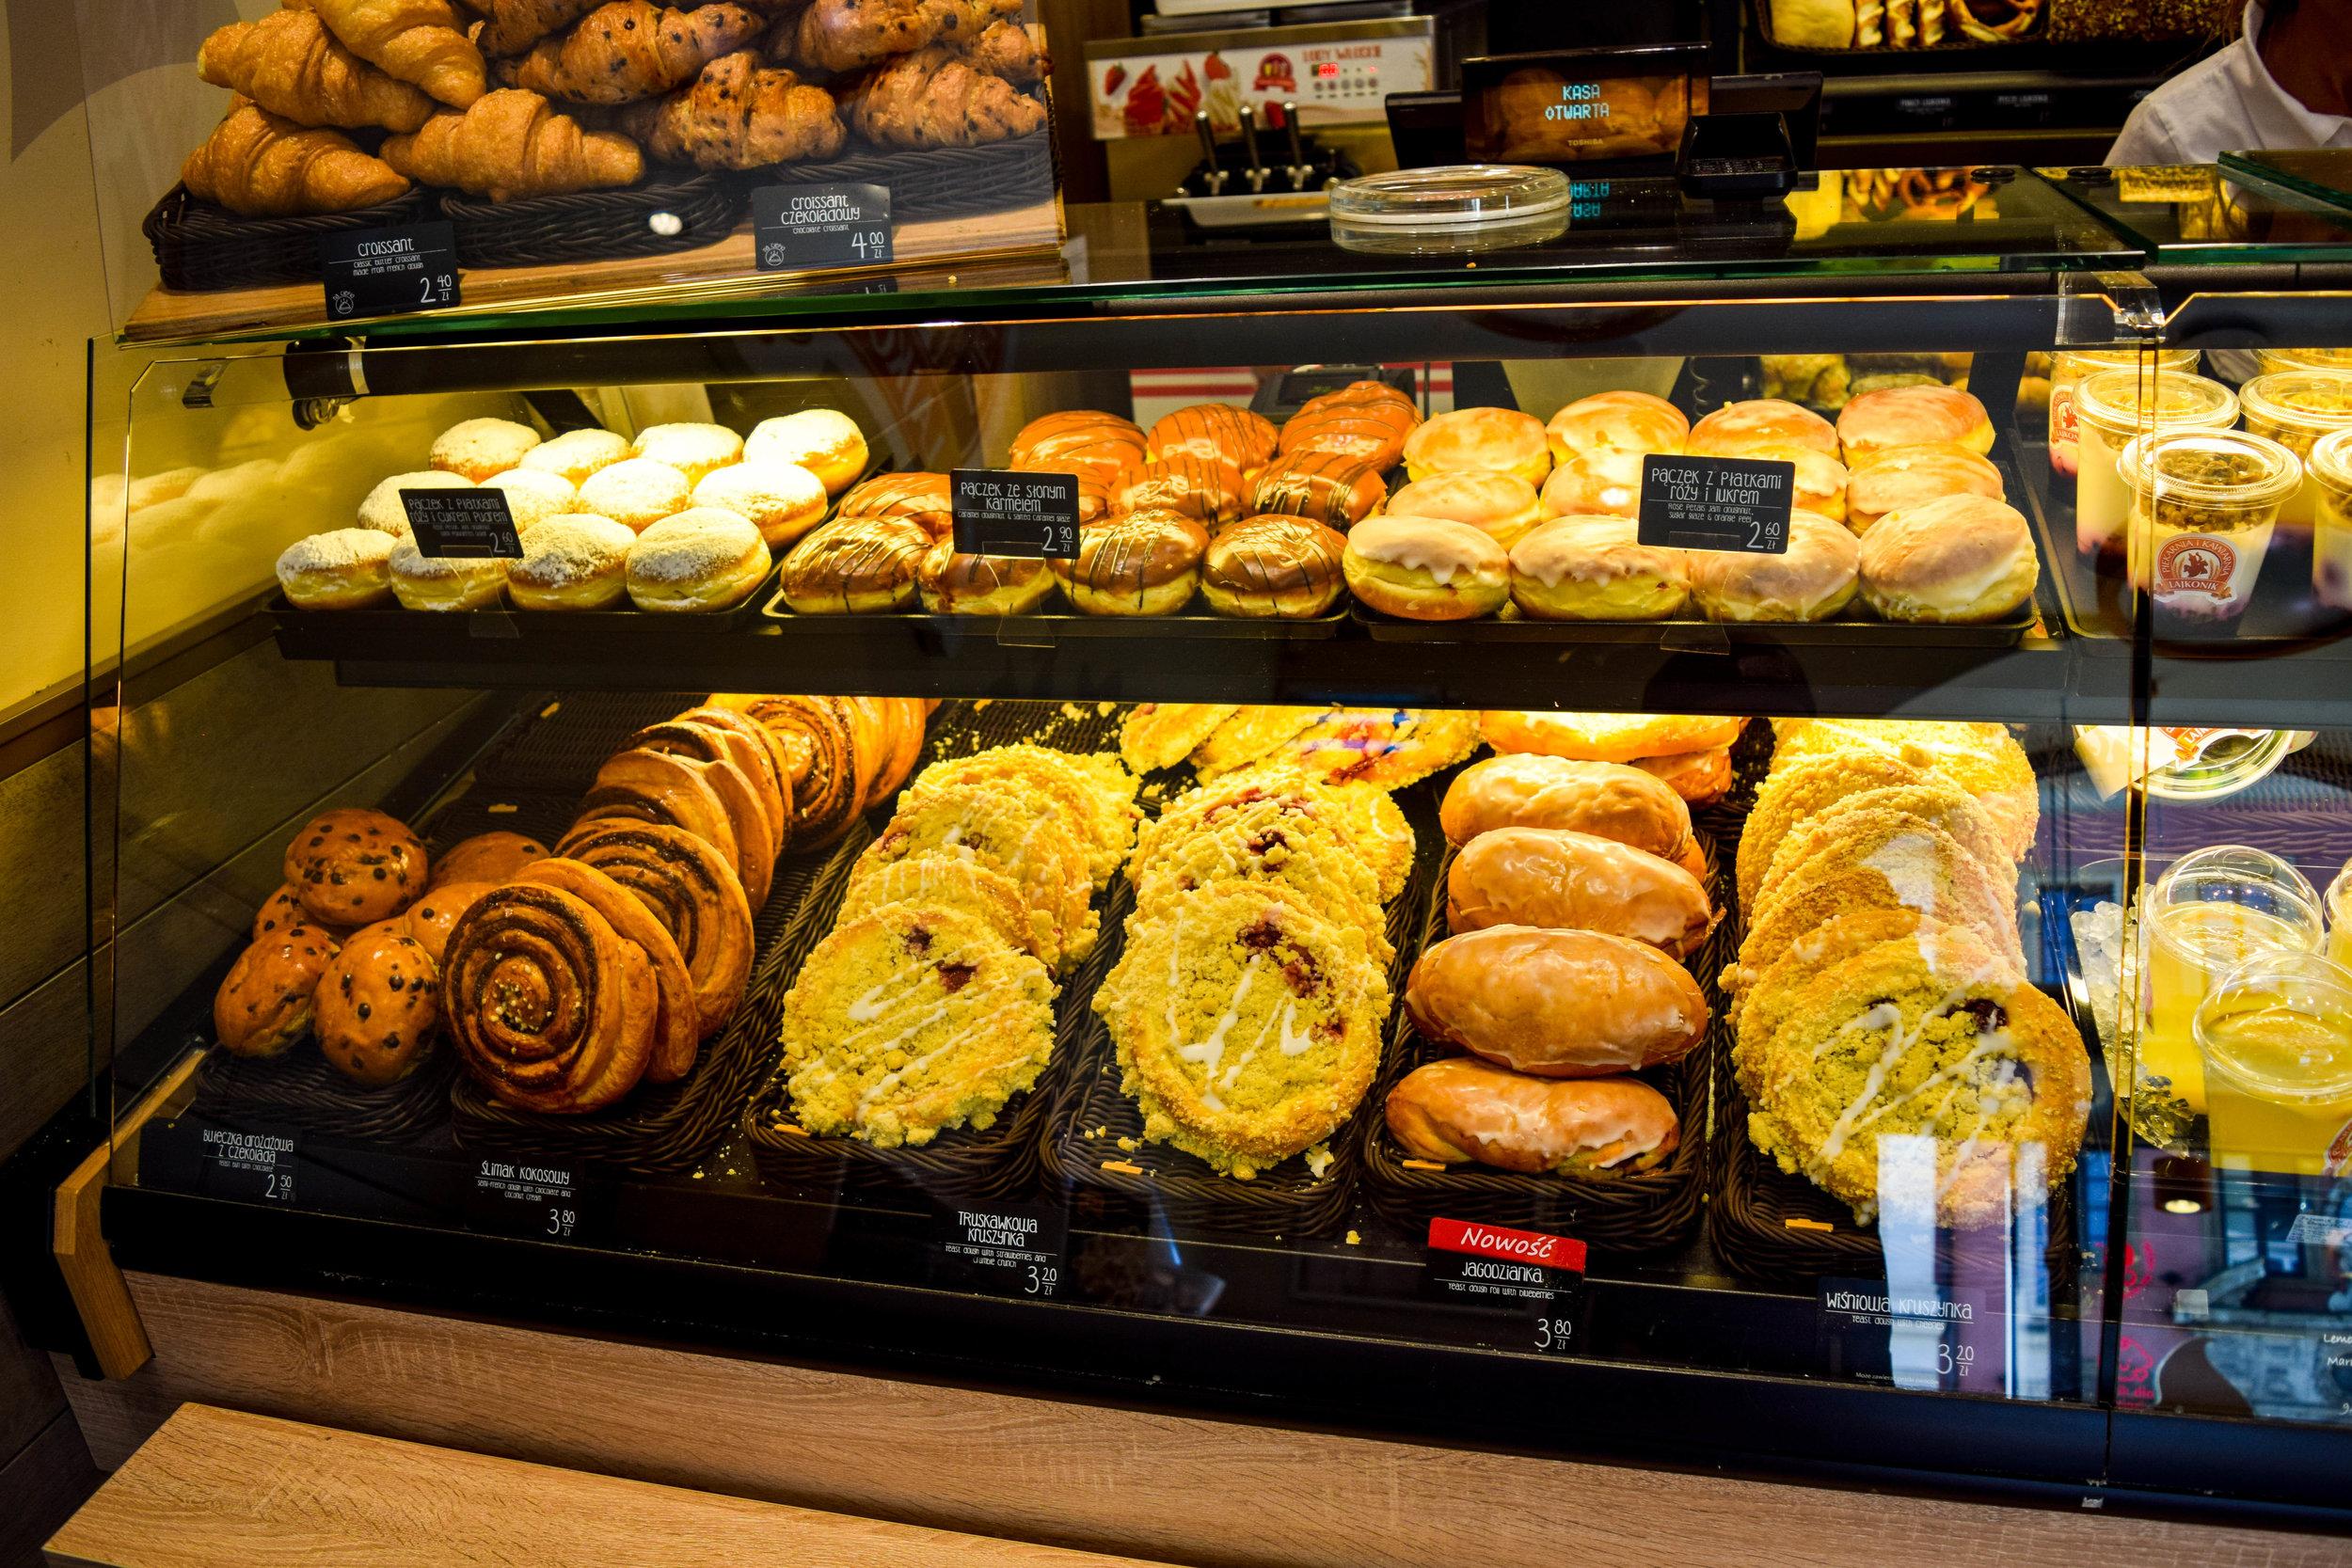 Selection of baked goods at Lajkonik